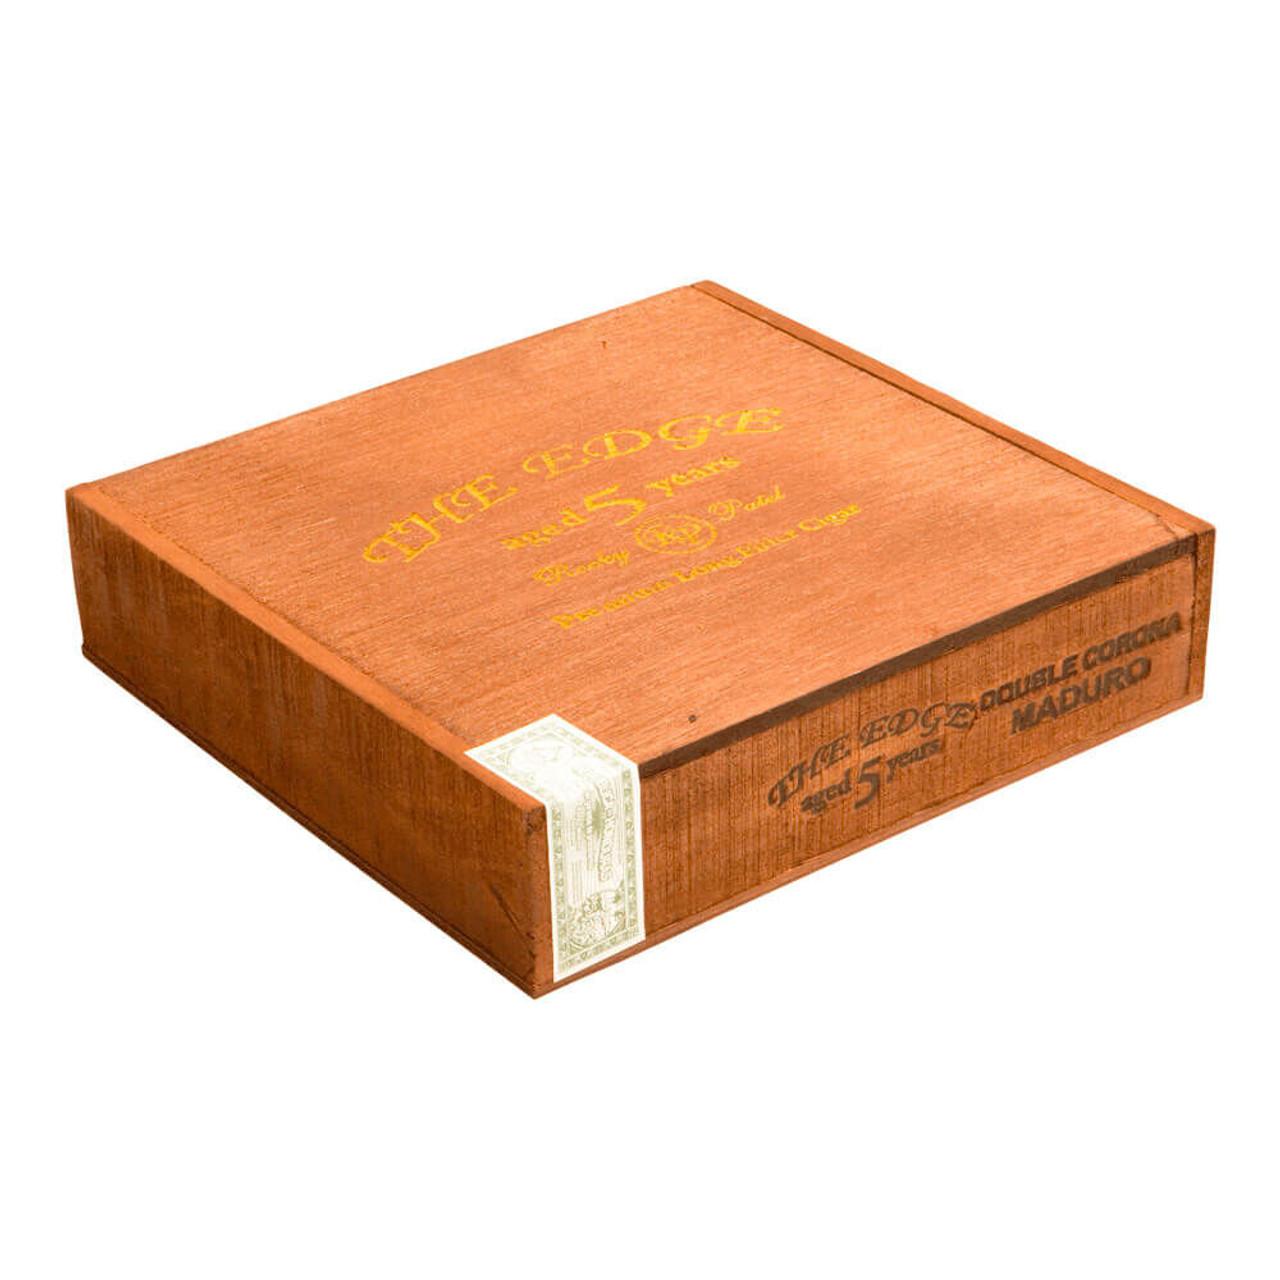 Rocky Patel The Edge Maduro Double Corona Cigars - 7.5 x 52 (Box of 20)